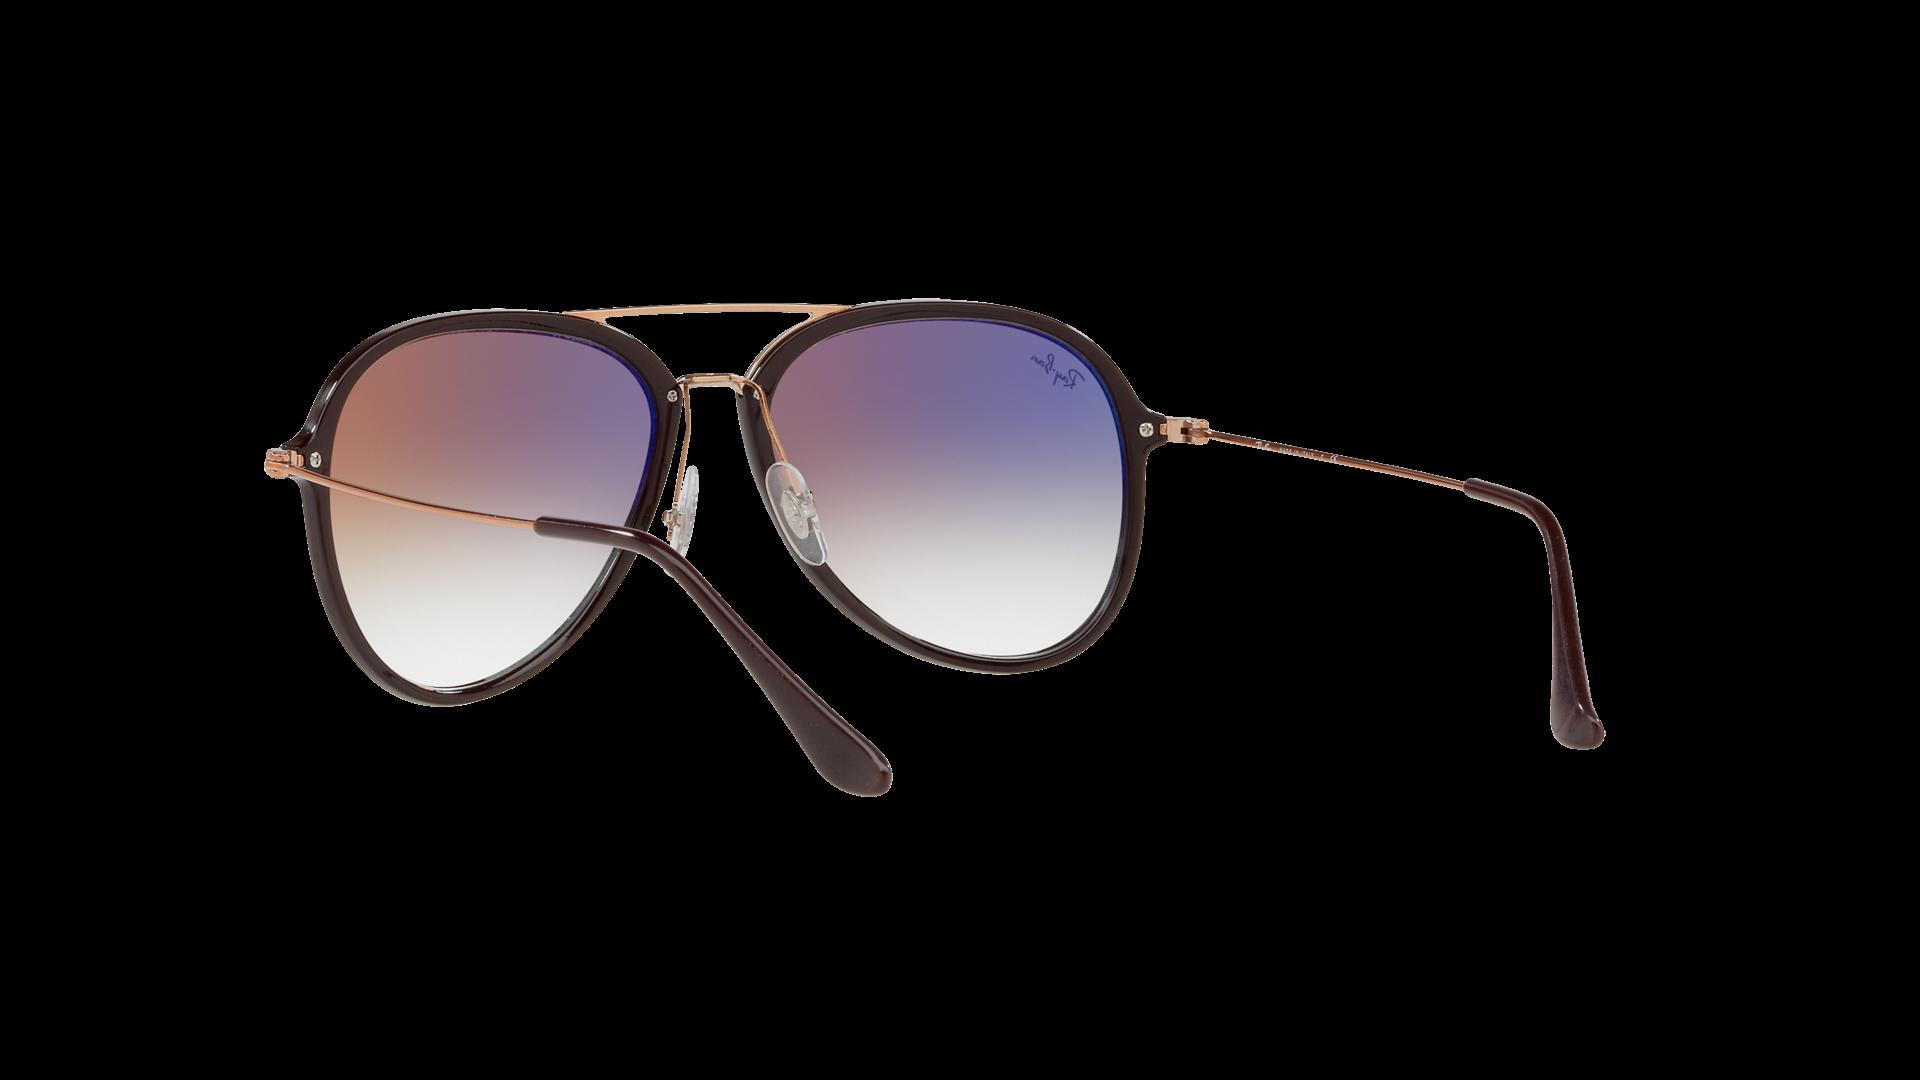 236c6f79eee Sunglasses Ray-Ban RB4298 6335 S5 57-17 Purple Large Gradient Mirror